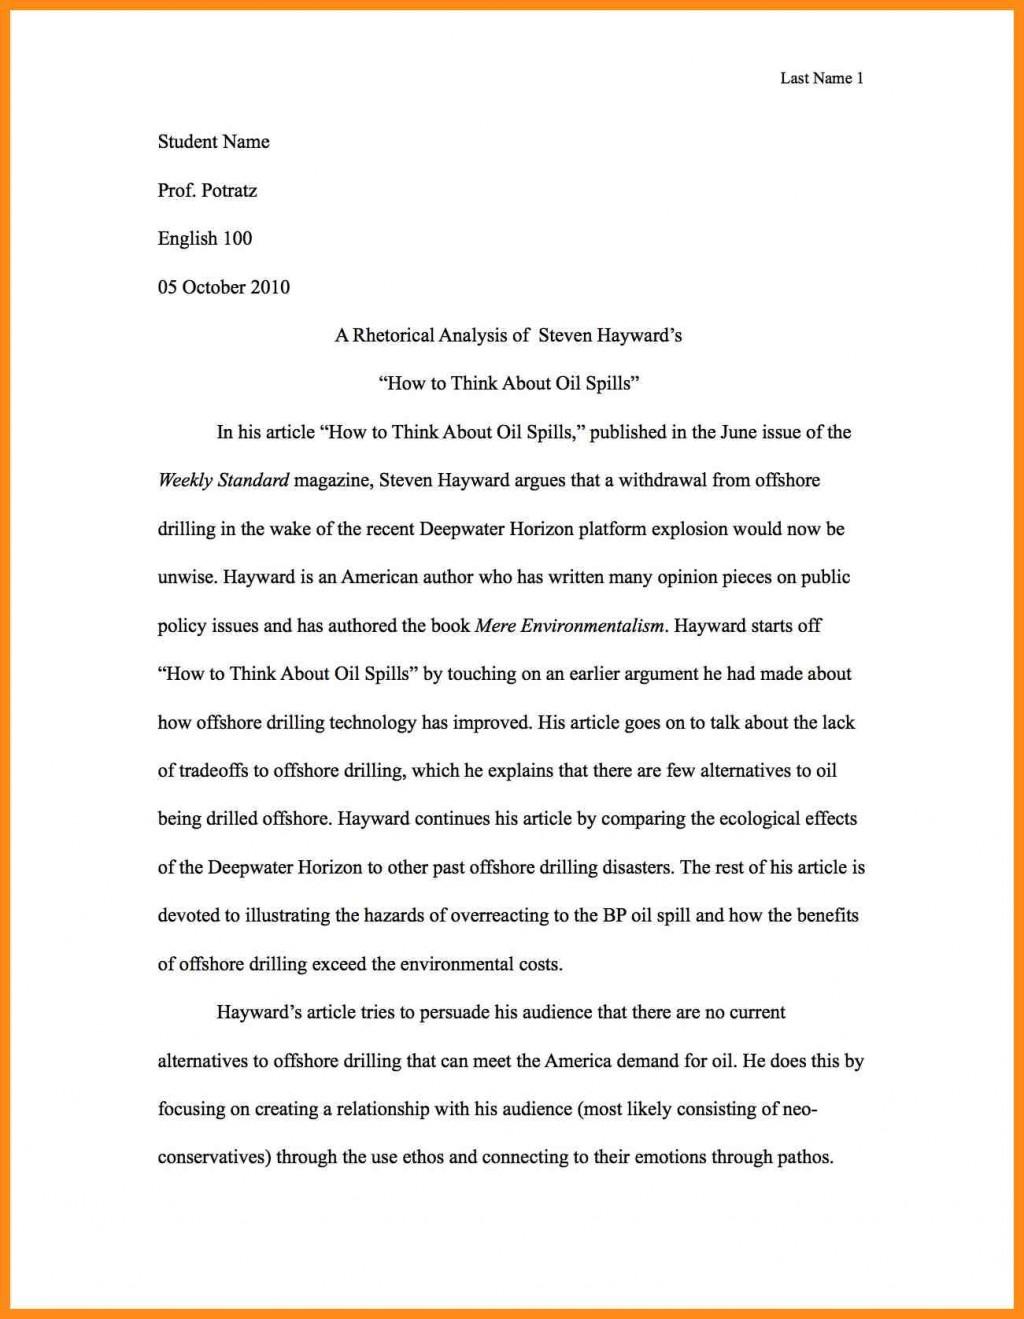 001 Write Best Rhetorical Analysis Essay Example Of Using Ethos Pathos And Logos Pdf Unusual Examples Ap Lang Strategies Large